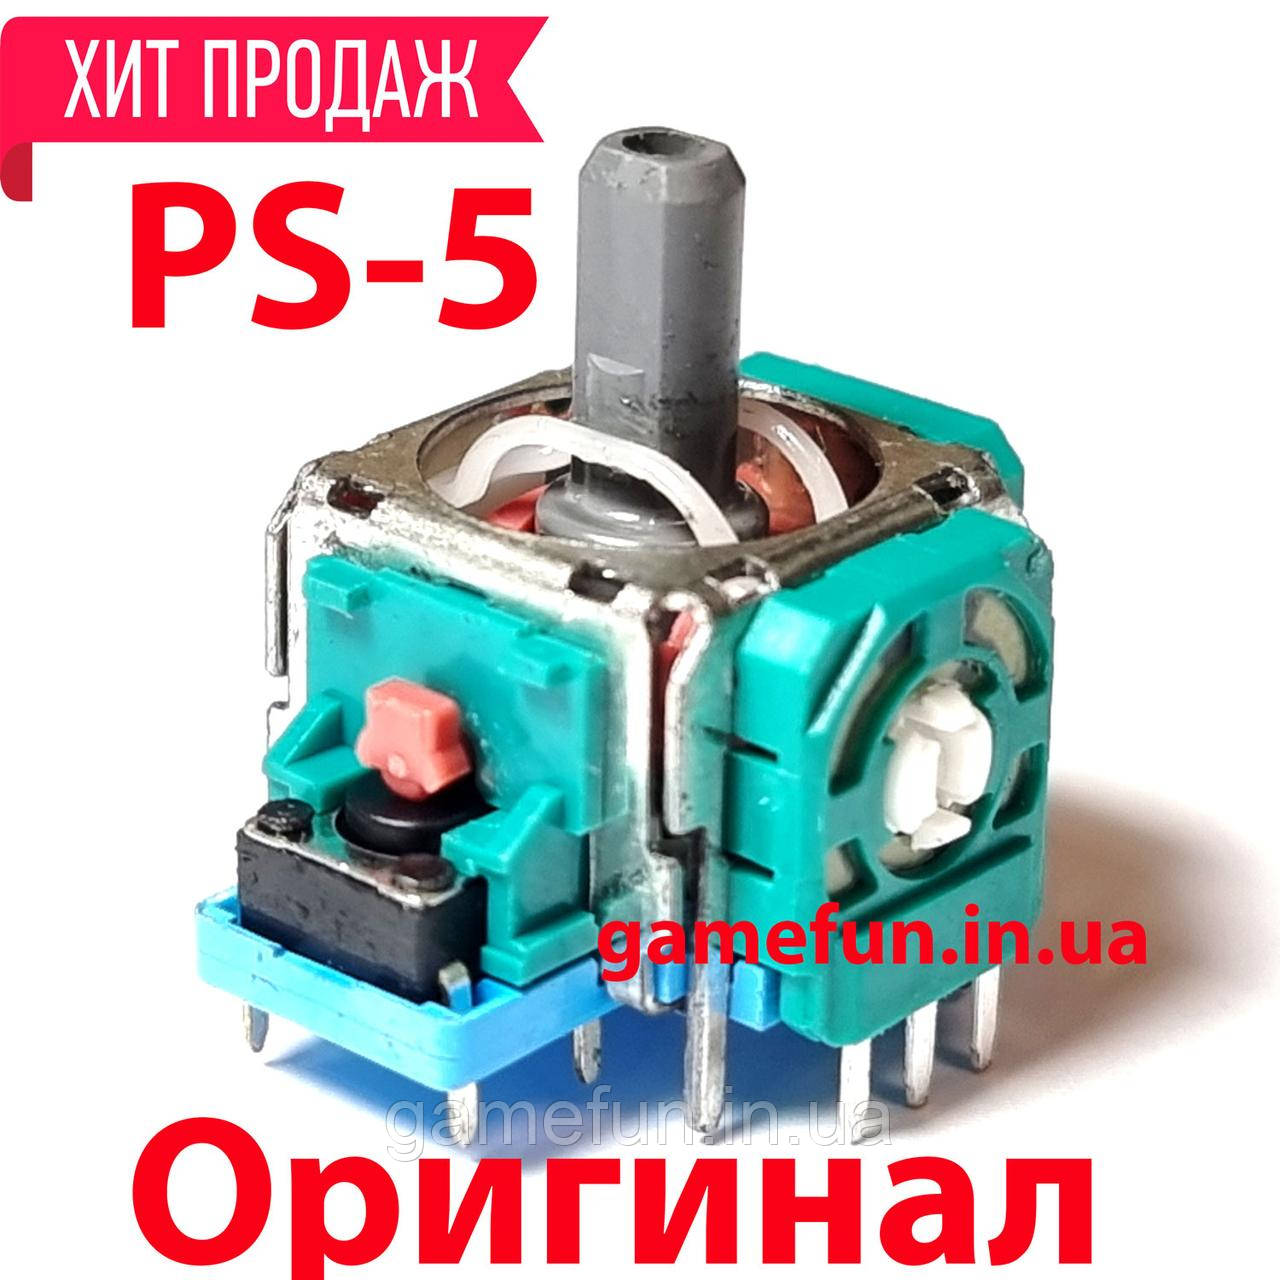 PS5 механизм аналога 3D геймпада DualSense (3 pin) (Оригинал)